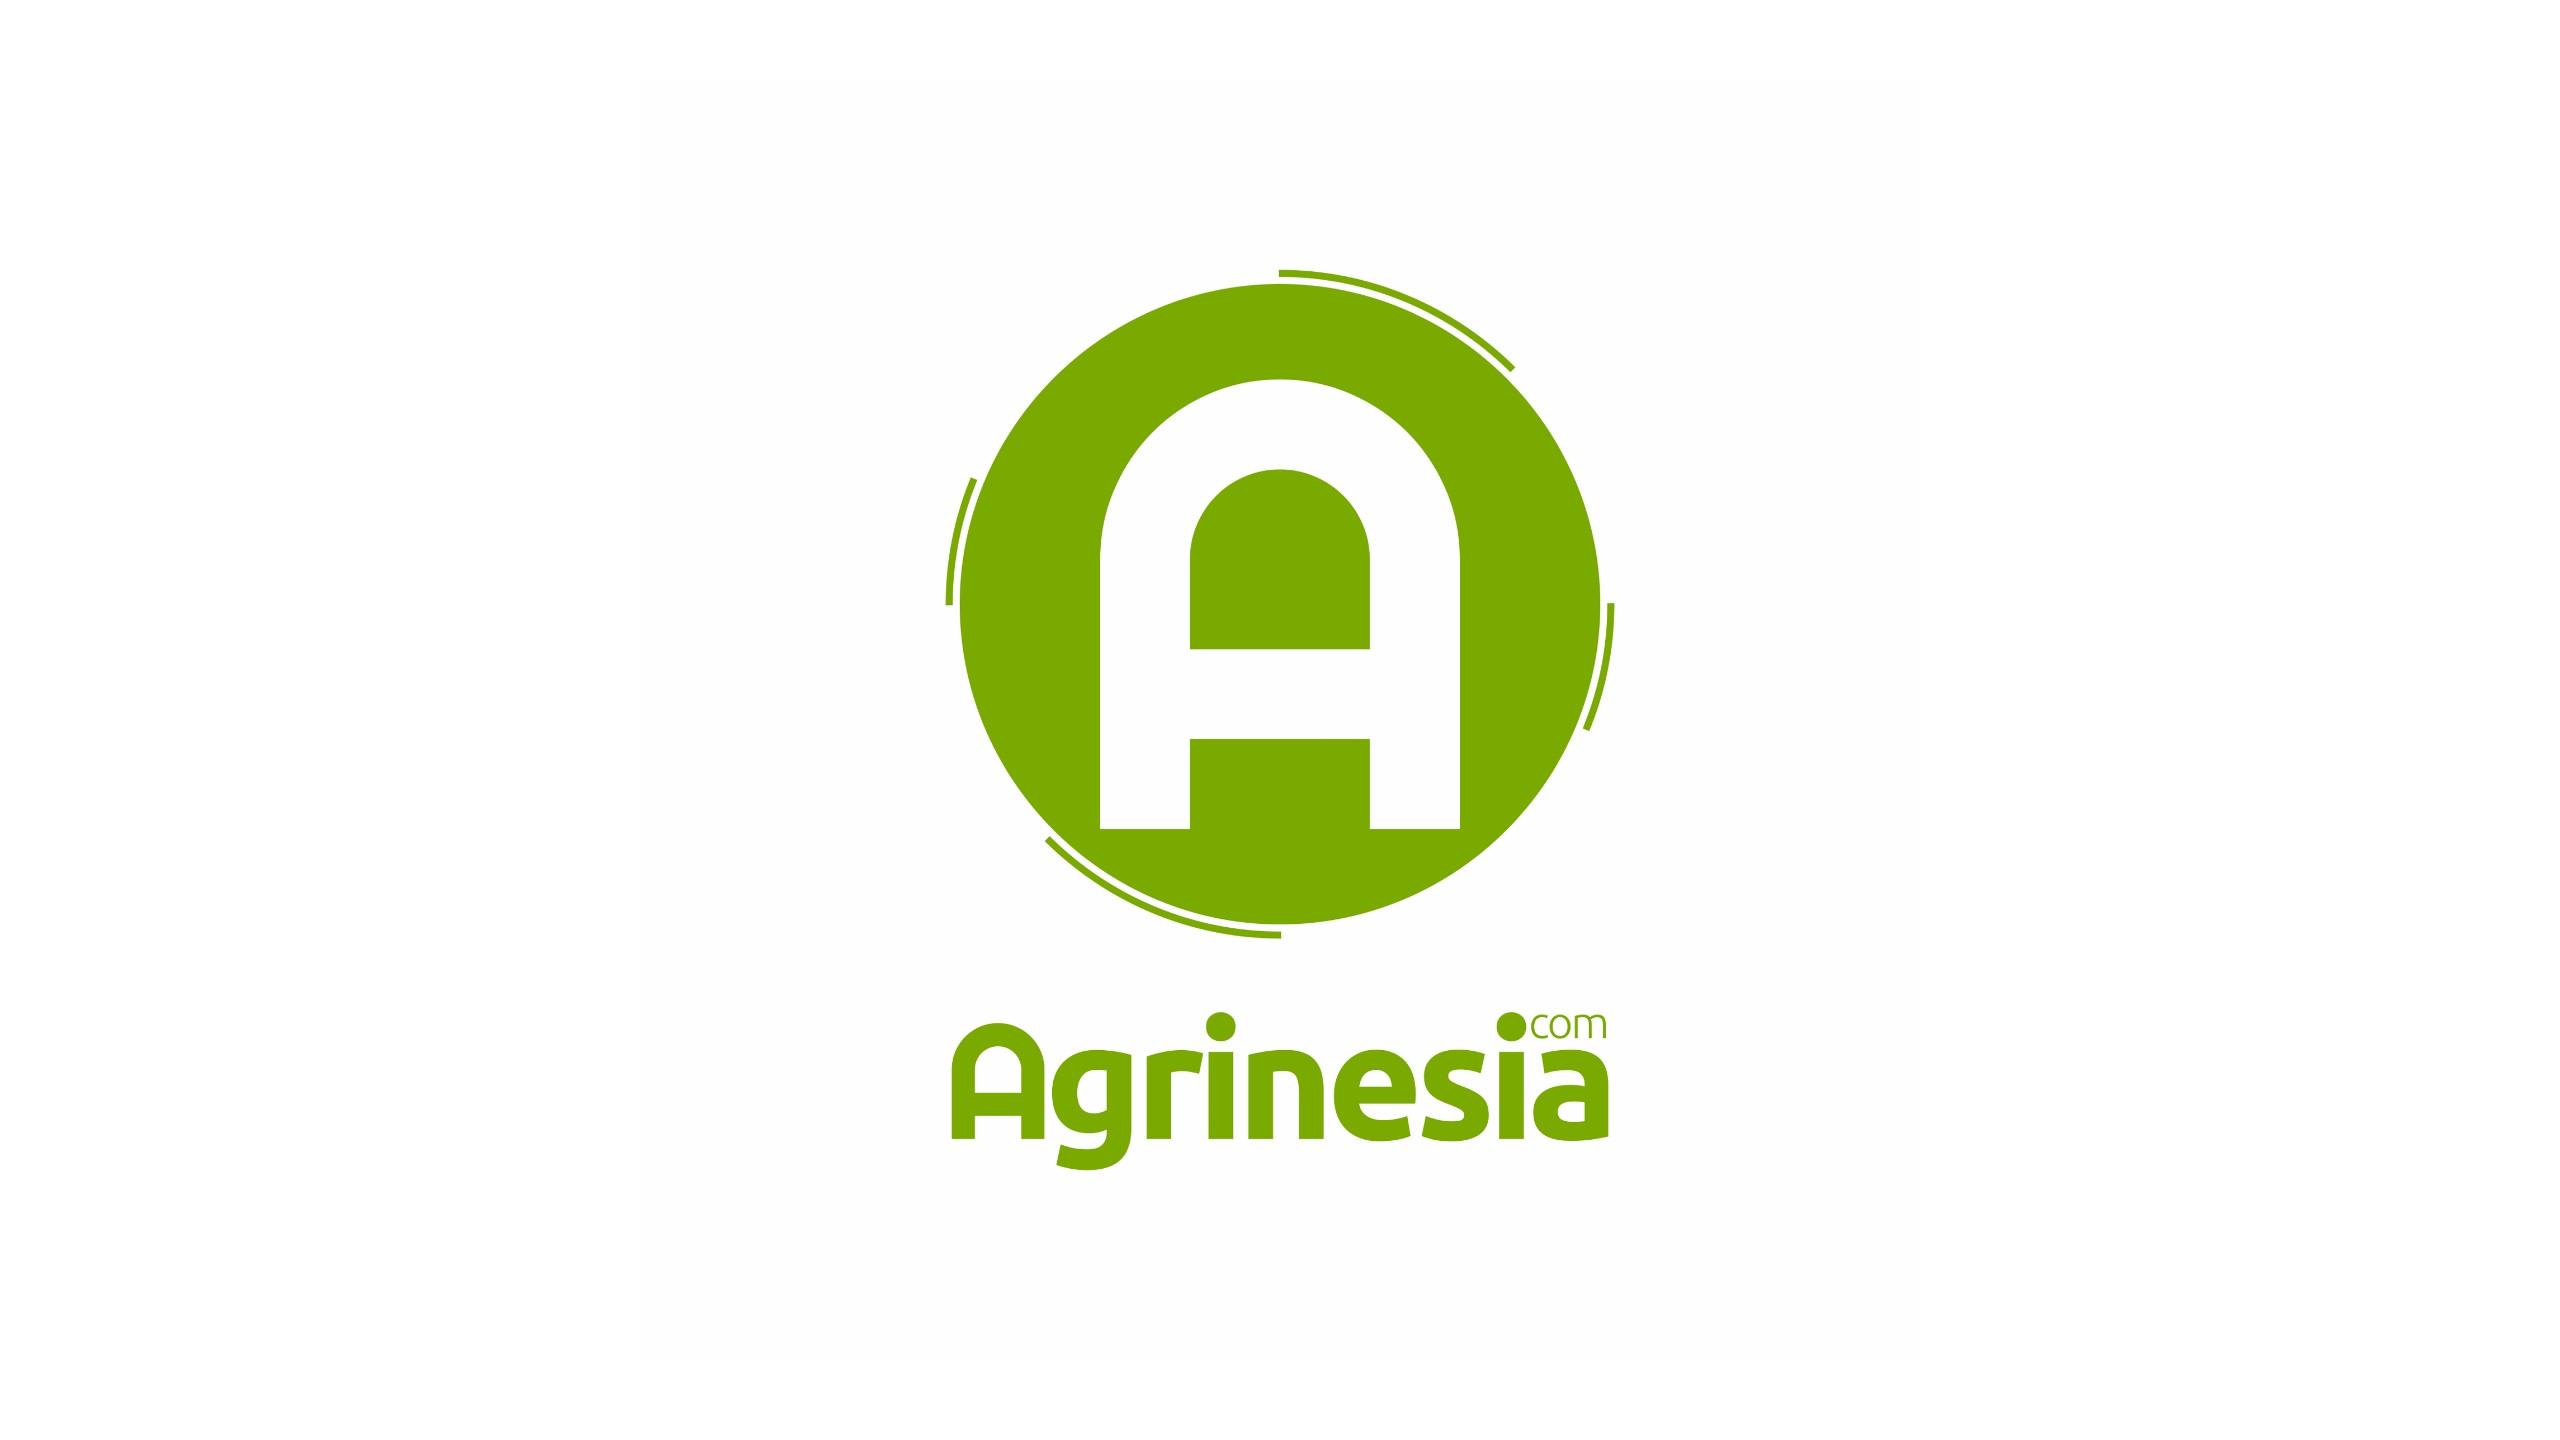 Agrinesia banner logo